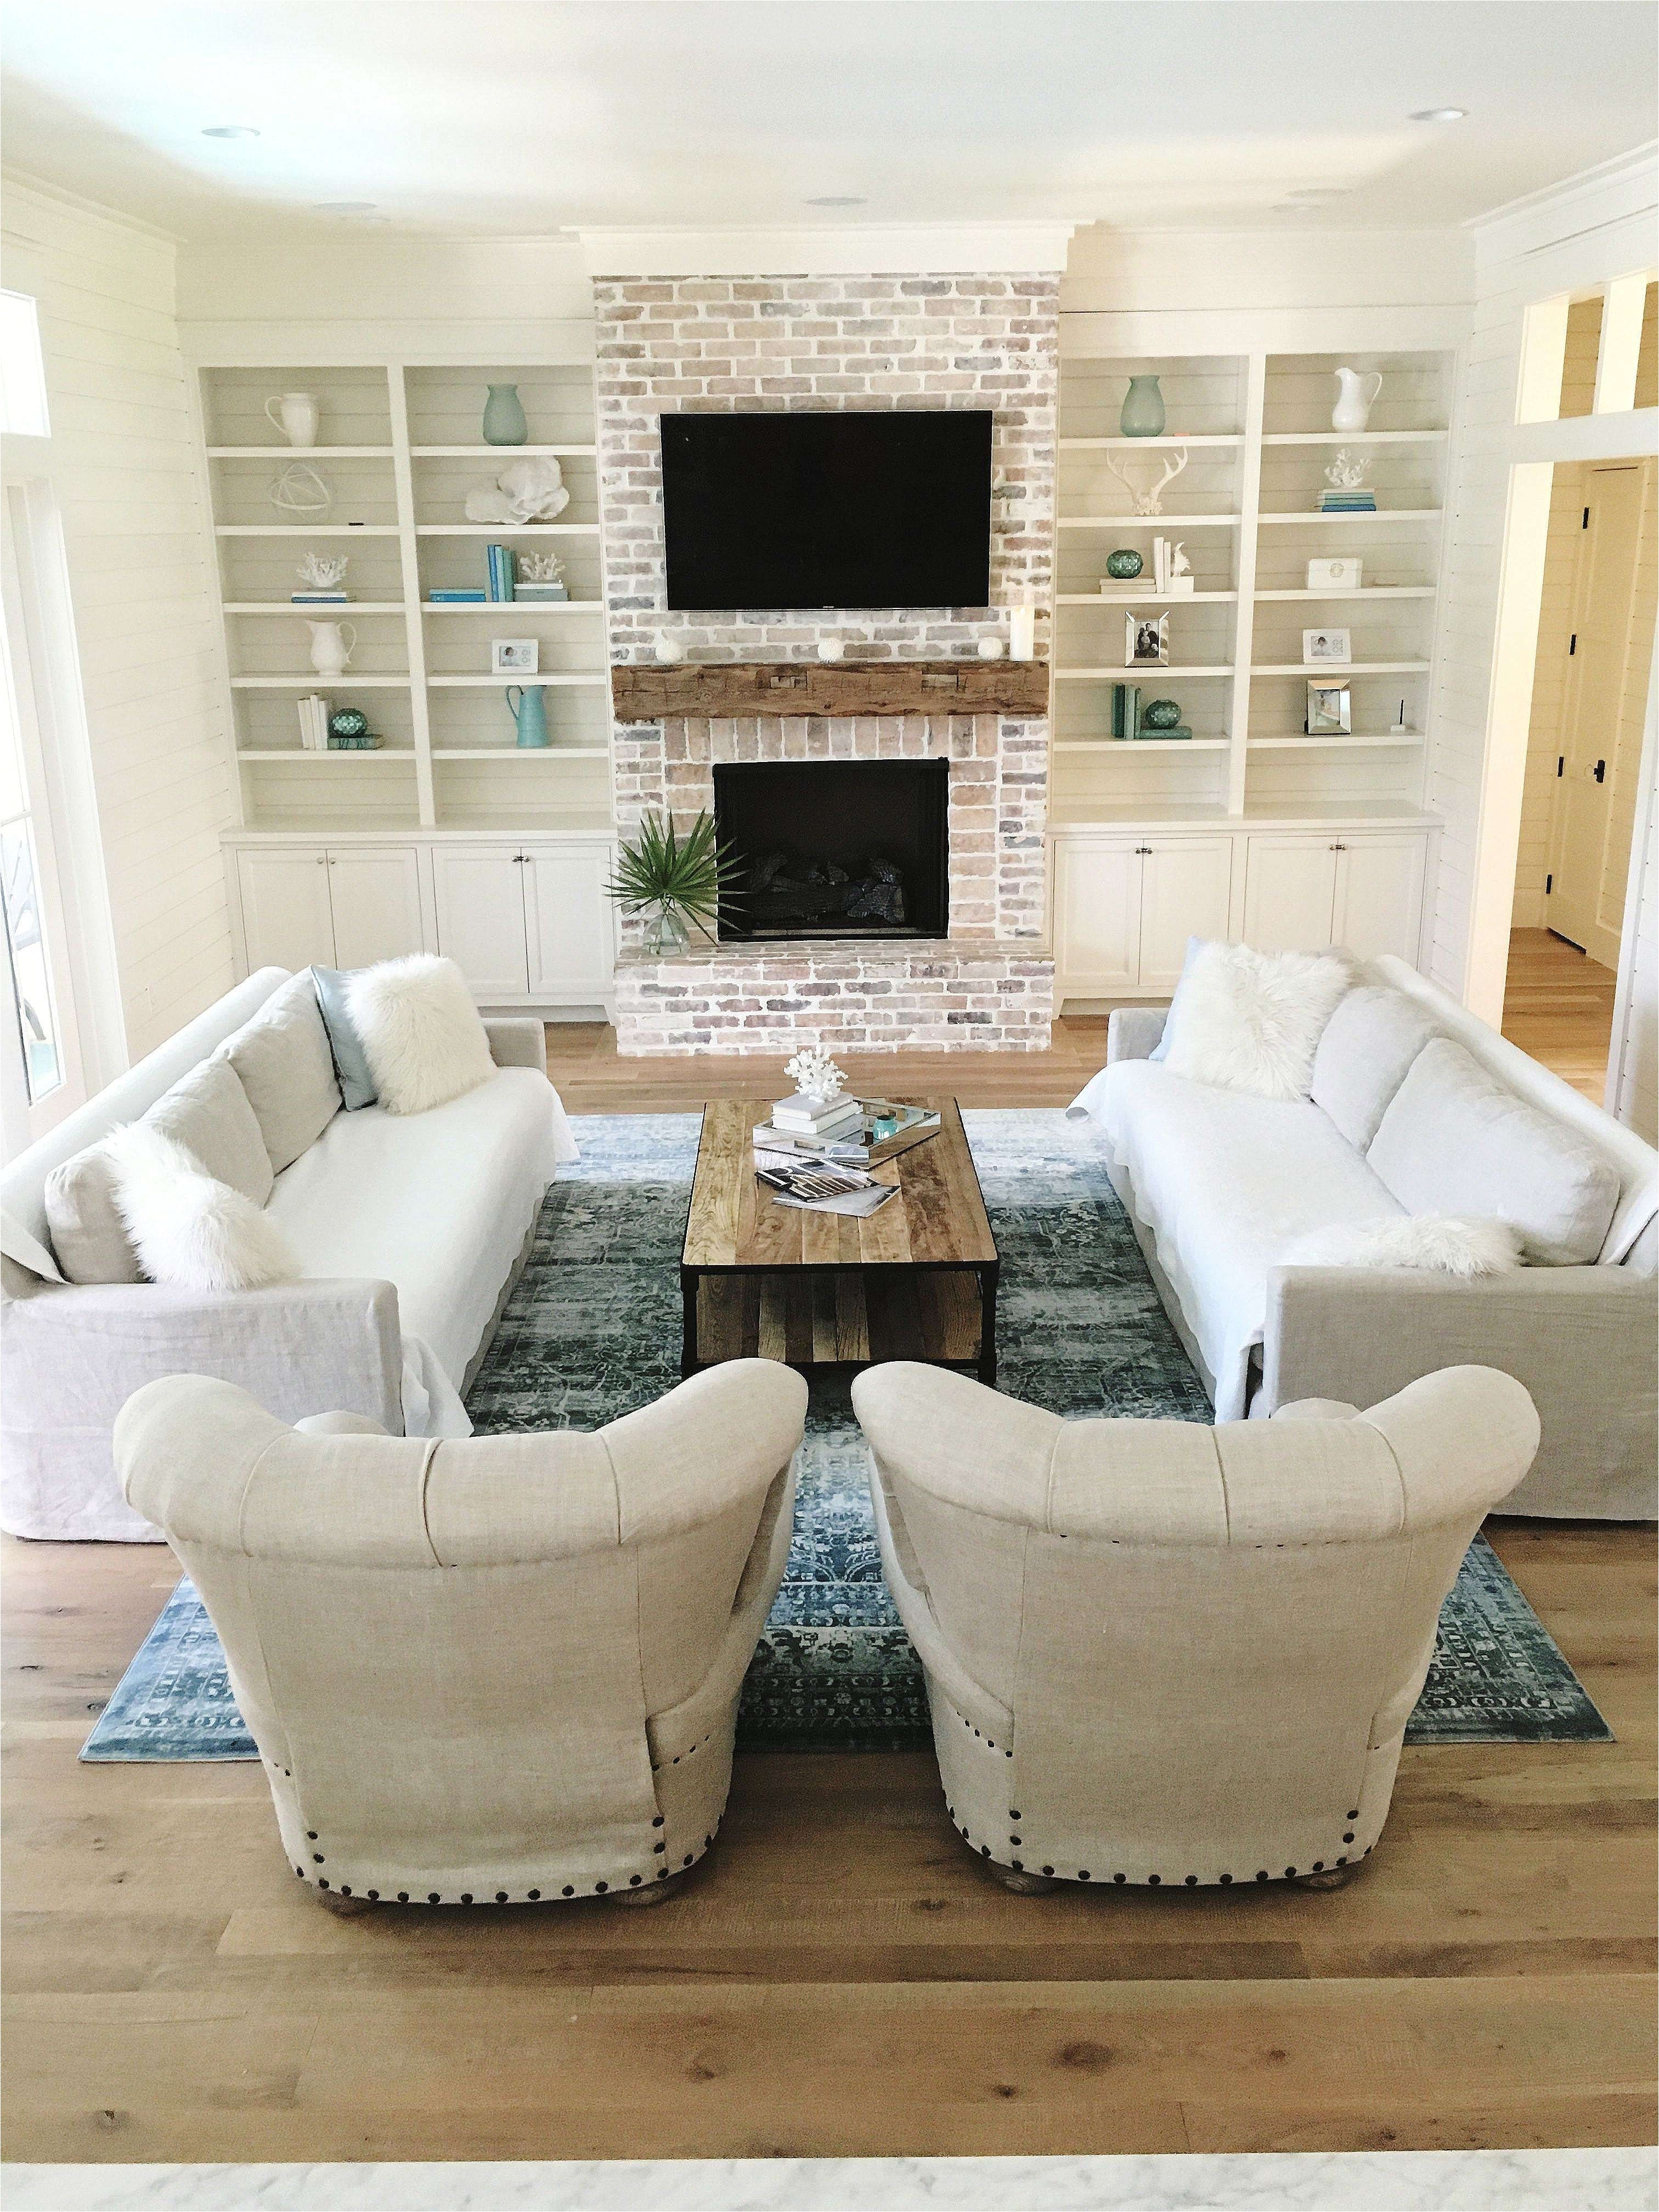 Table Lamps for Living Room Modern Lovely Living Room Table Lamps